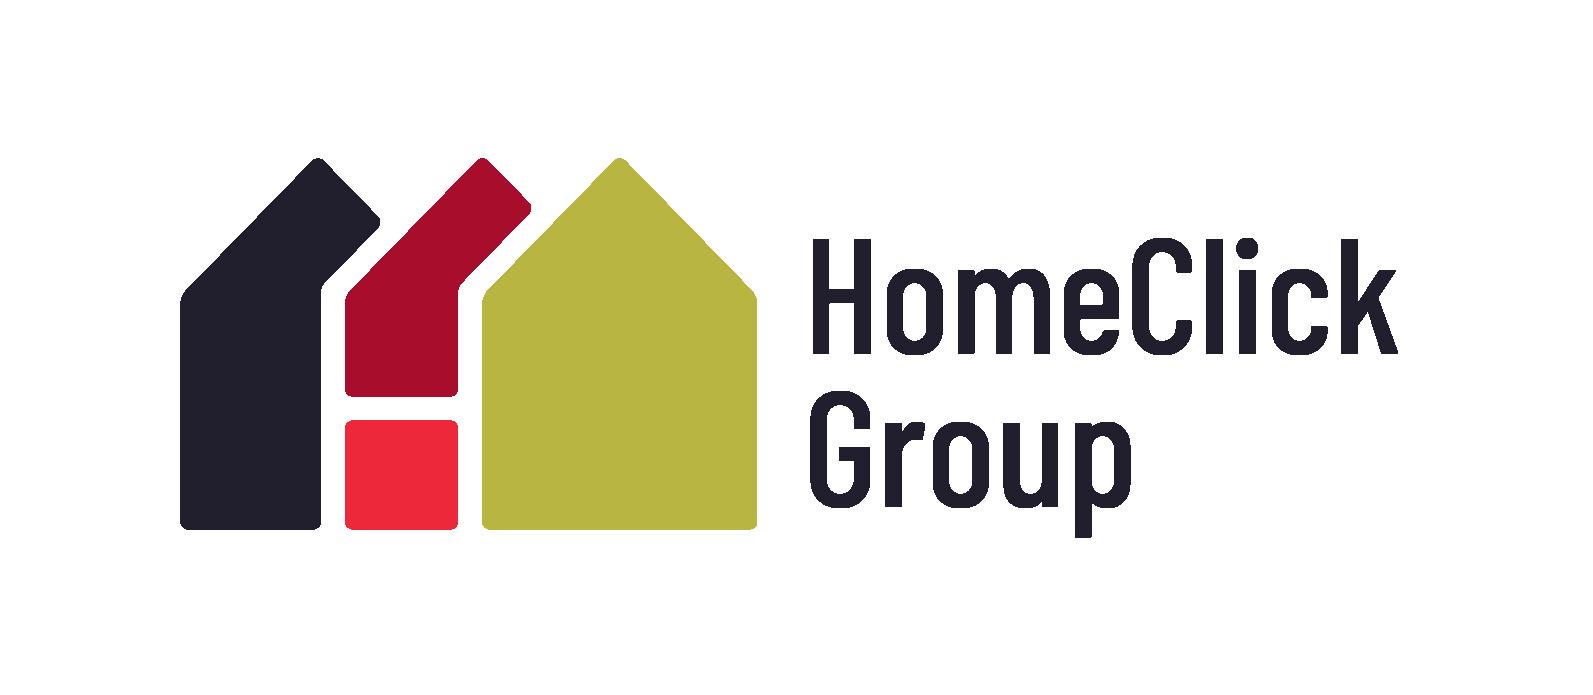 Homeclick Group logo